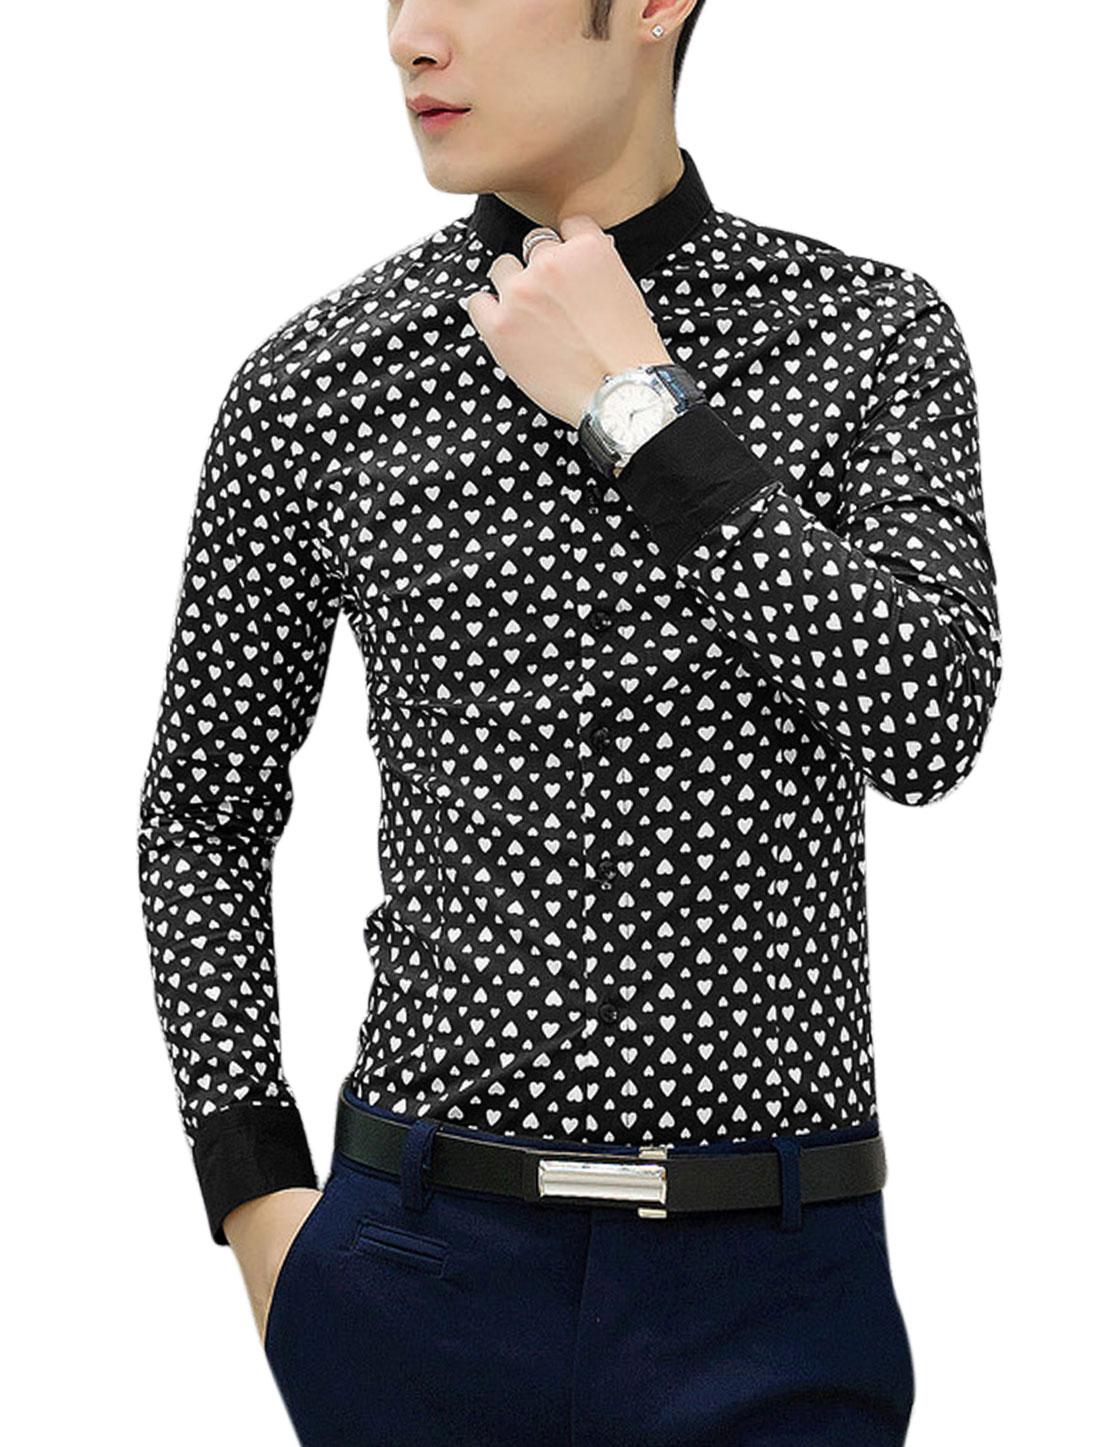 Men Allover Hearts Print Button Closed Point Collar Button Down Shirt Black M